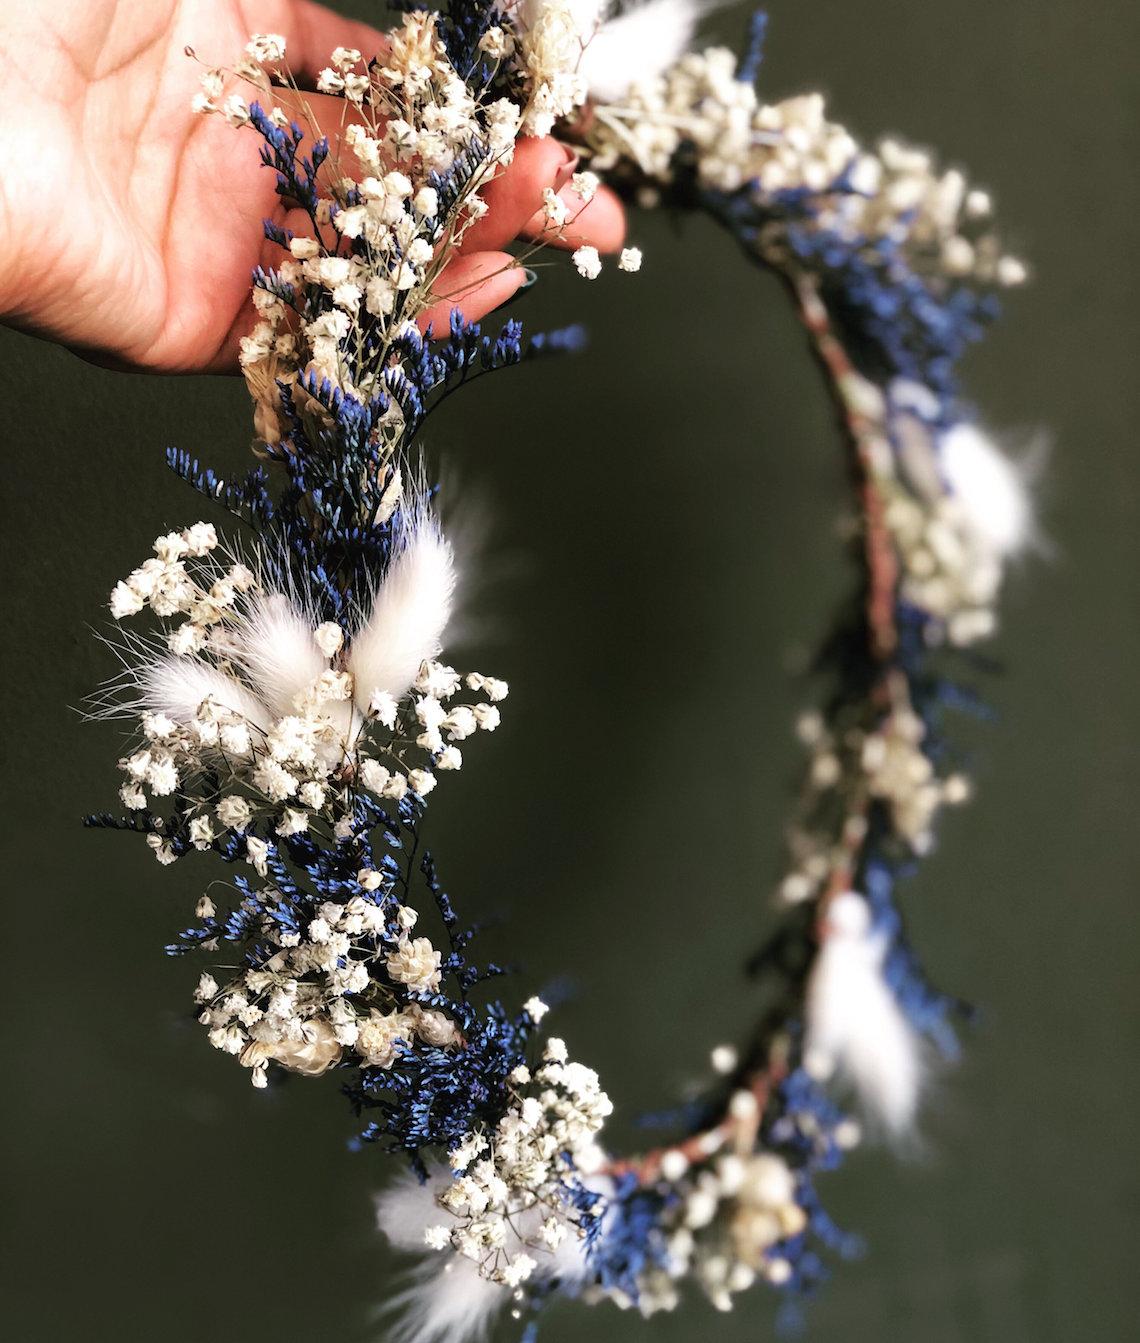 multicolored flower crown dried flowers